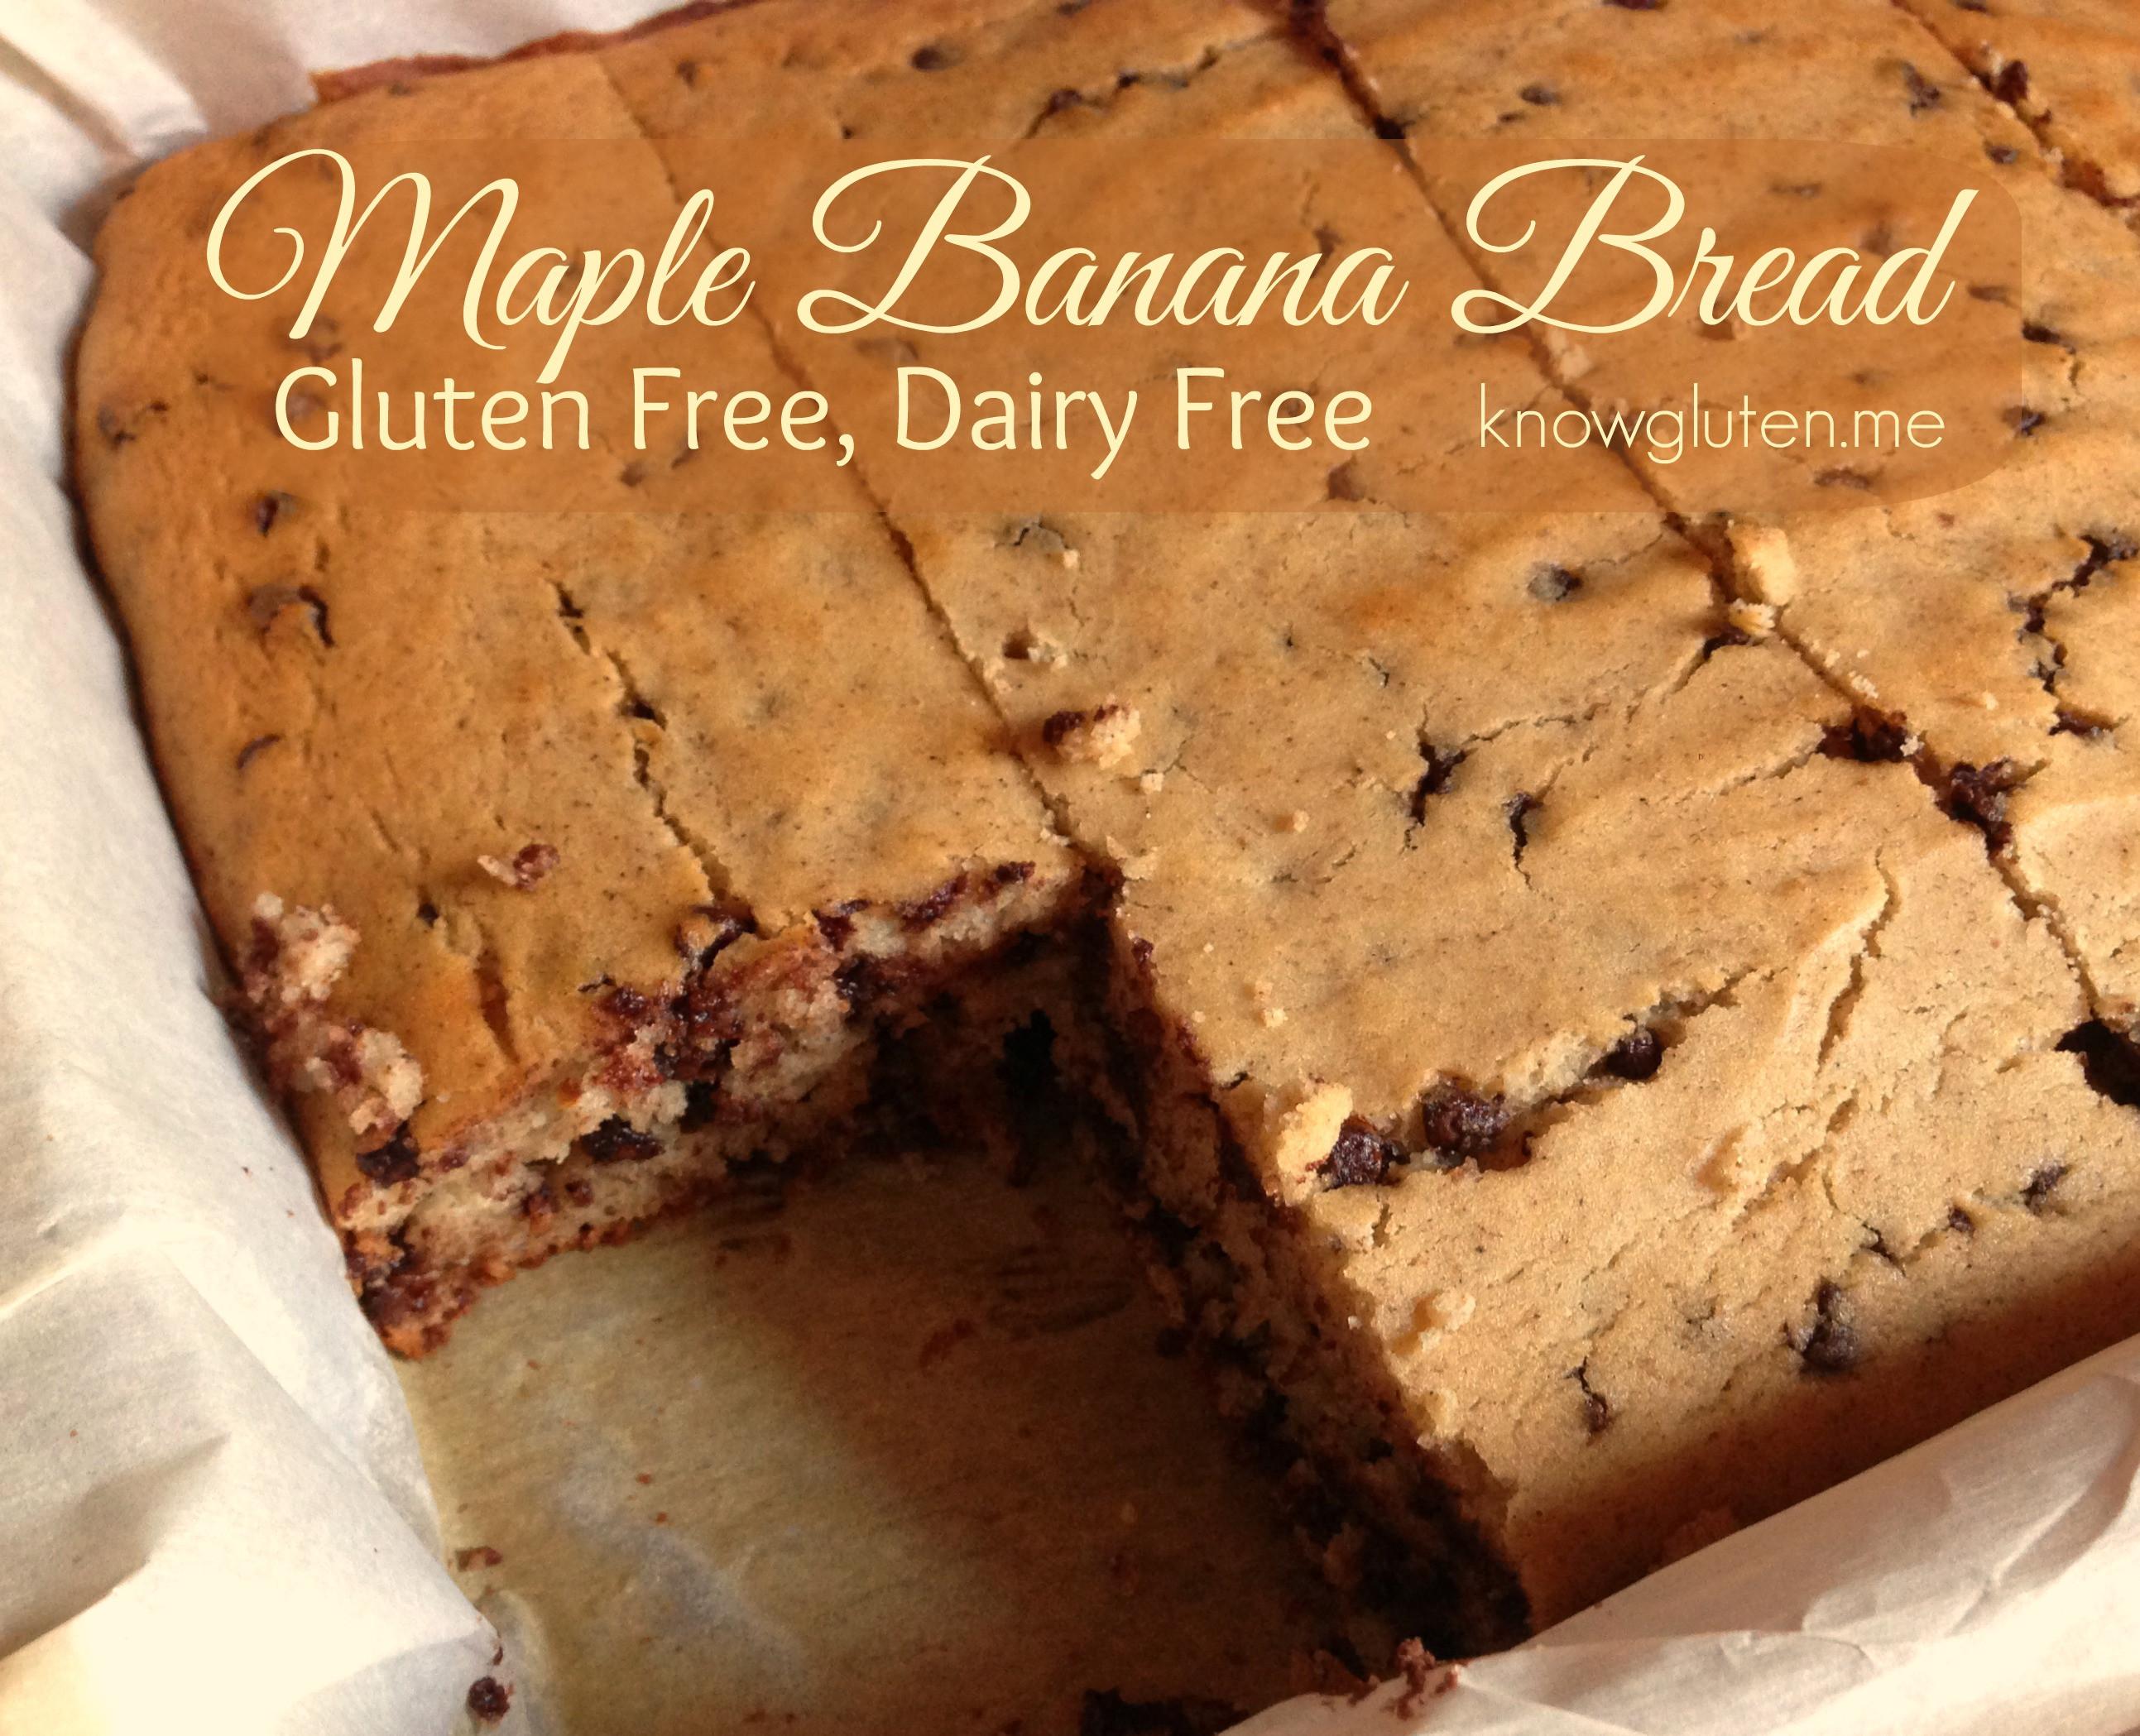 Banana Bread Dairy Free  Gluten Free Dairy Free Maple Banana Bread know gluten